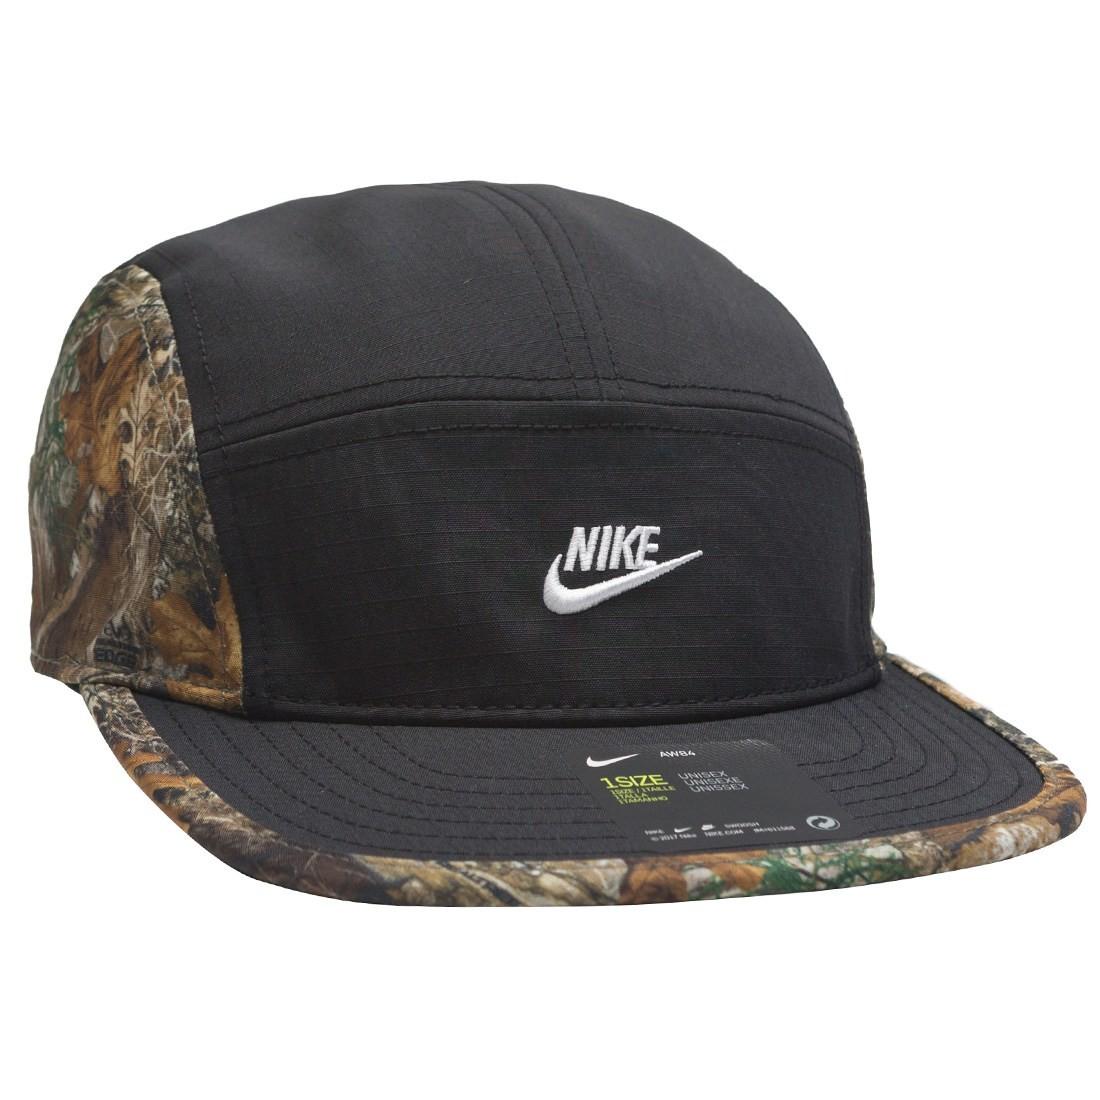 Nike Men Nrg Sportswear Aw84 Rlt Realtree Adjustable Cap (black / white)